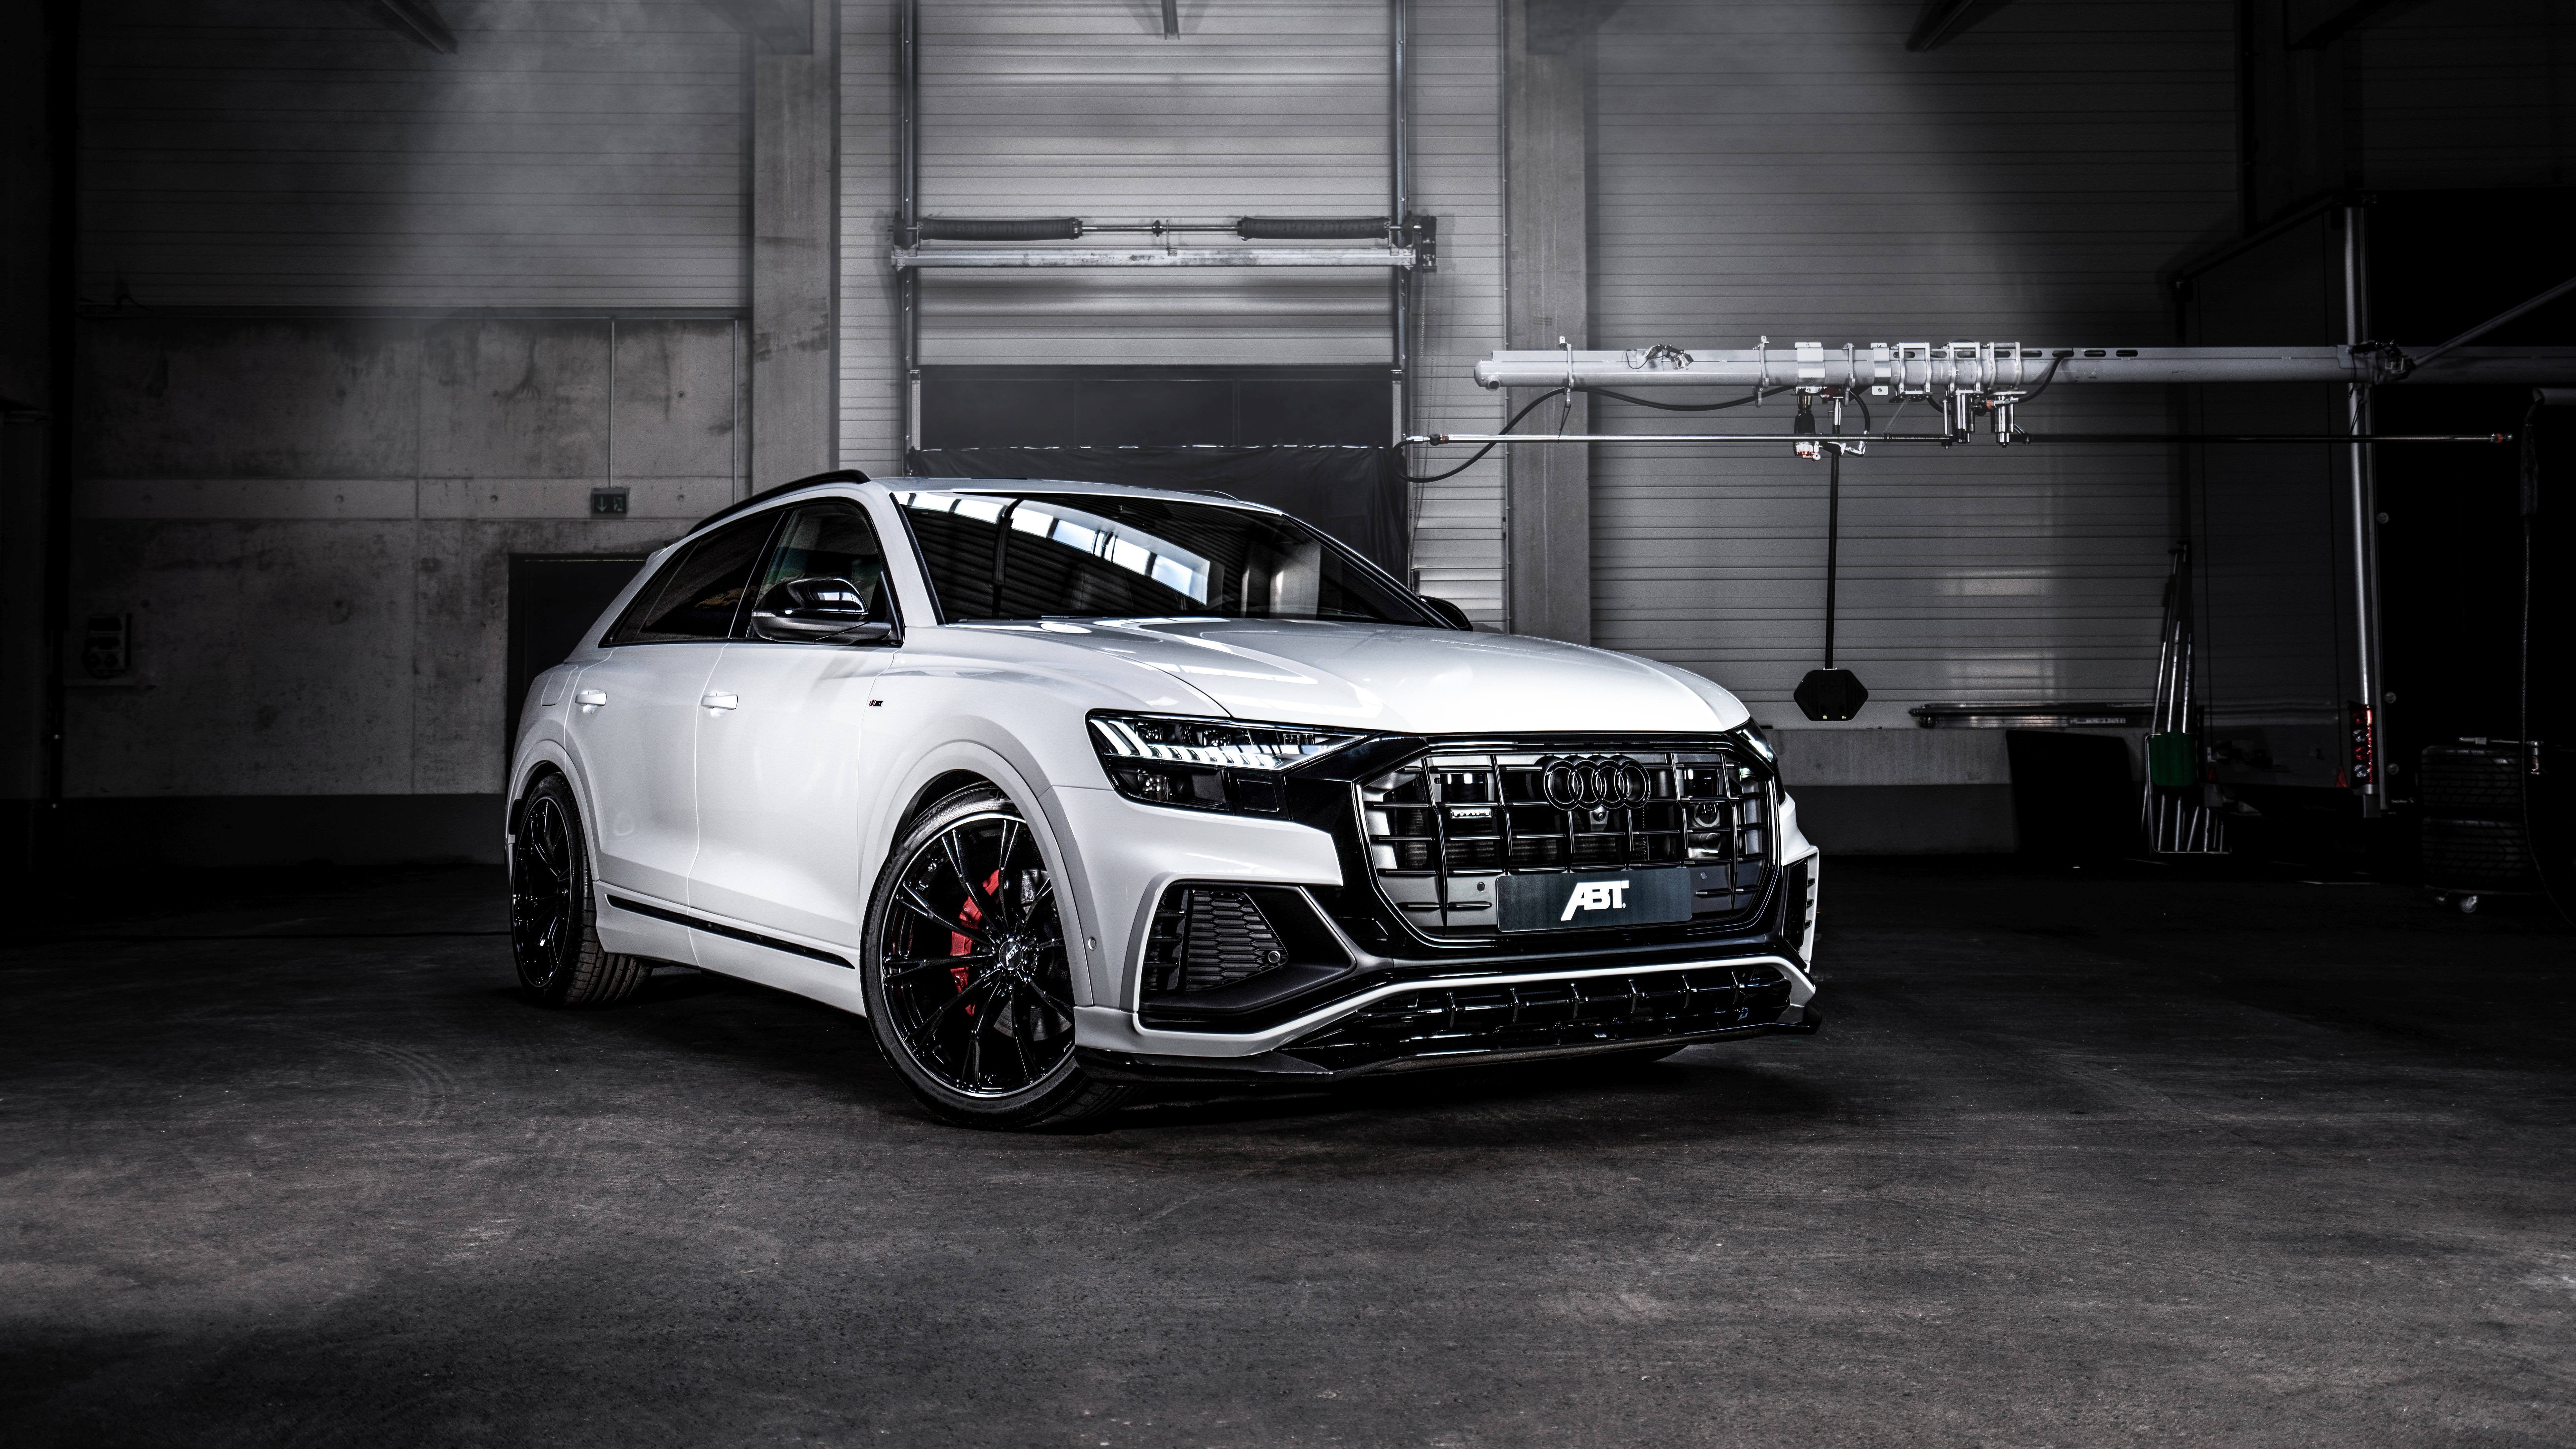 ABT Audi Q8 2019 4K 8K Wallpaper | HD Car Wallpapers | ID ...